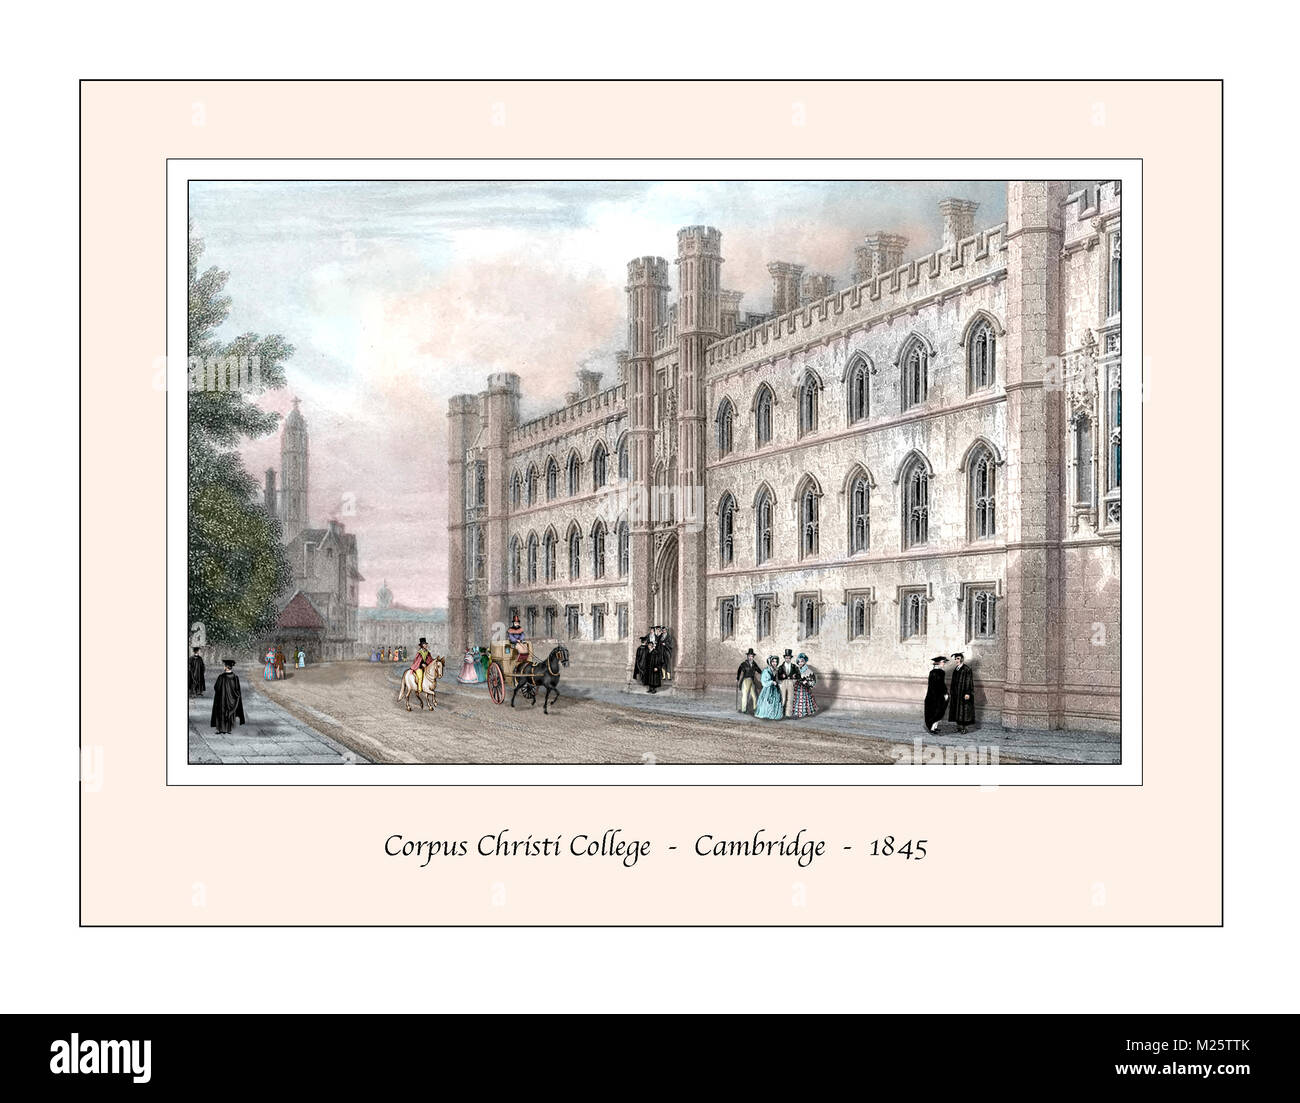 Corpus Christi College Cambridge Original Design based on a 19th century Engraving - Stock Image